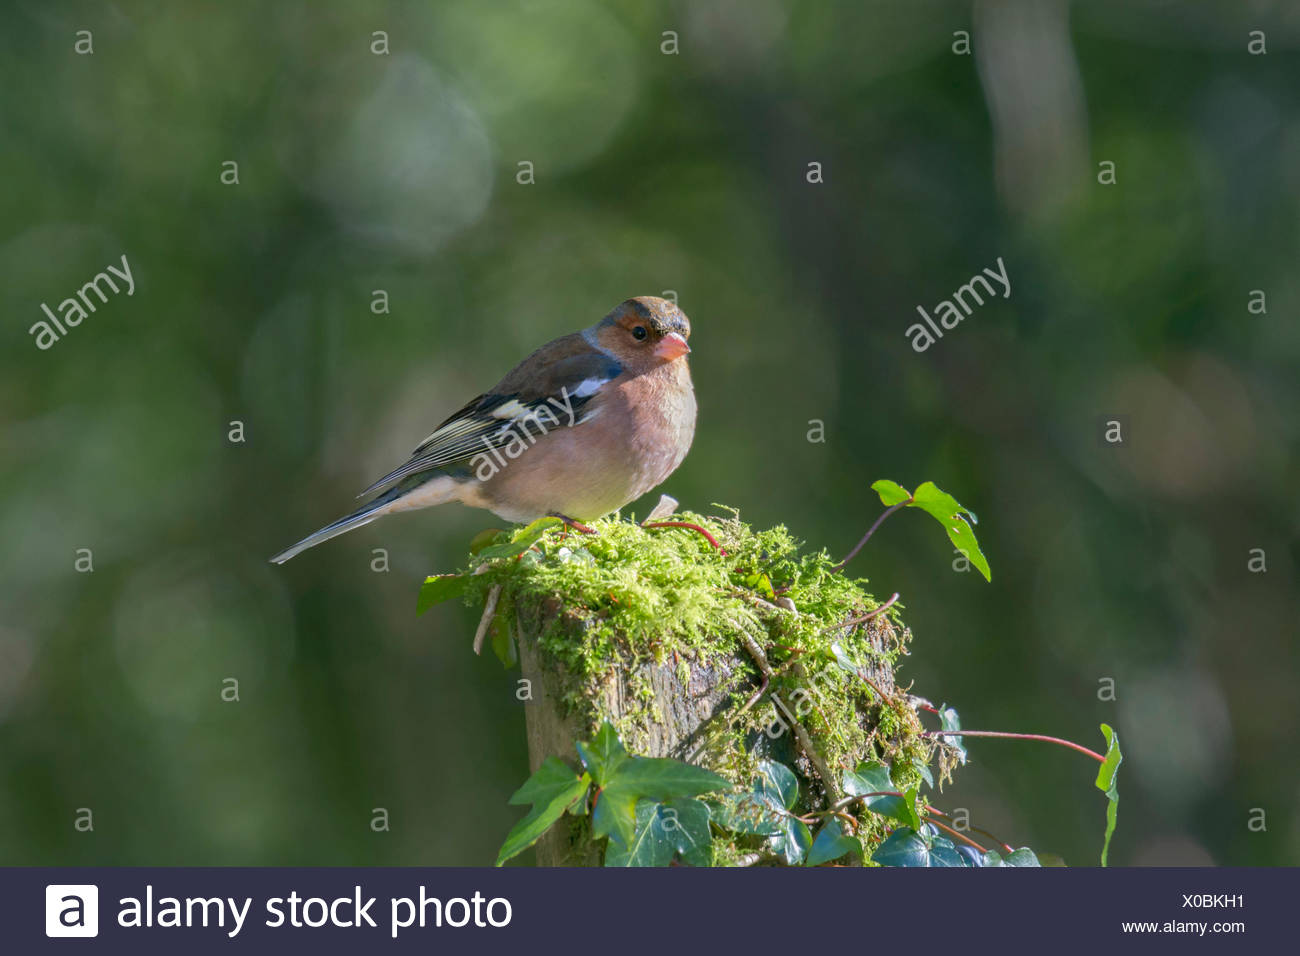 Common Chaffinch (Fringilla coelebs), South Wales, Wales, United Kingdom - Stock Image